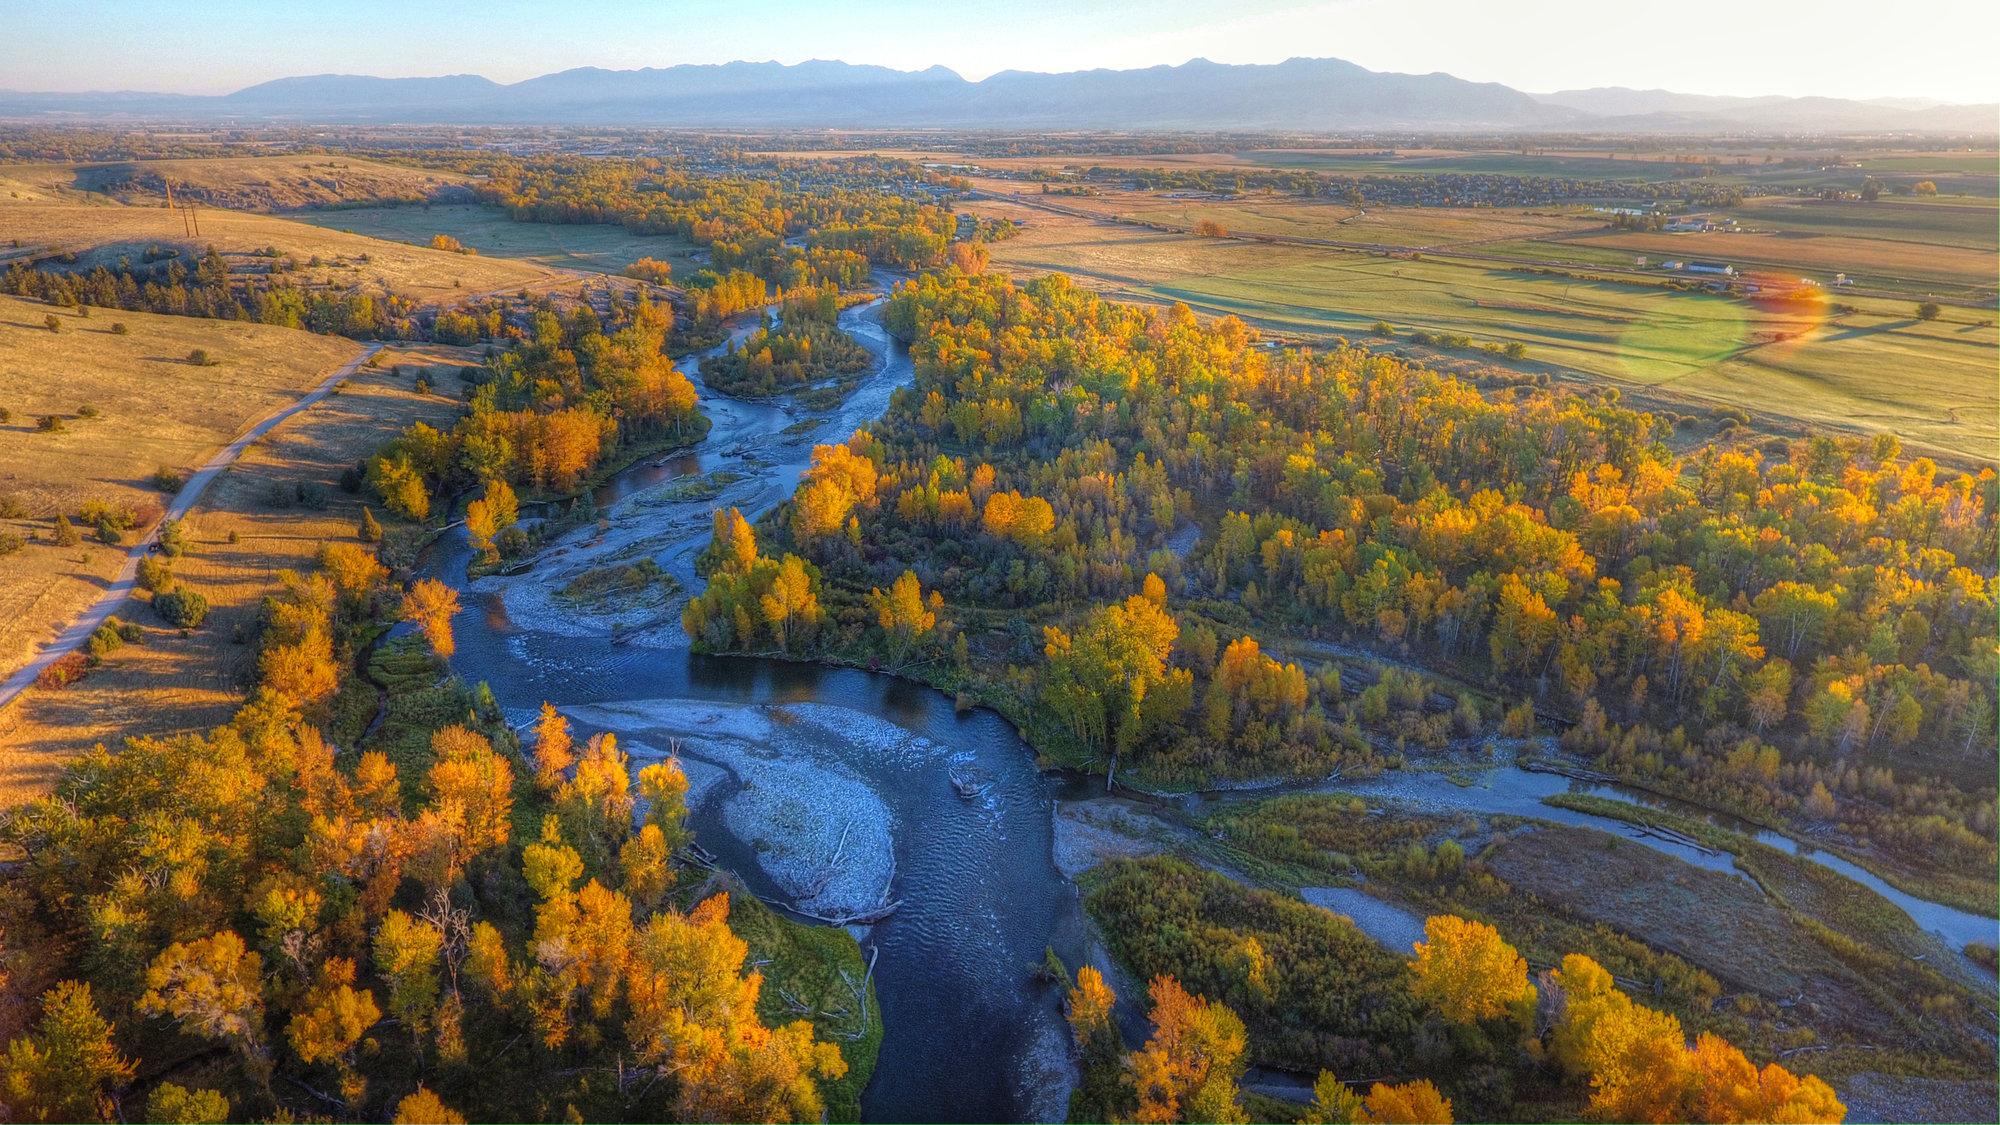 bozeman ranchettes ranches for sale montana real estate